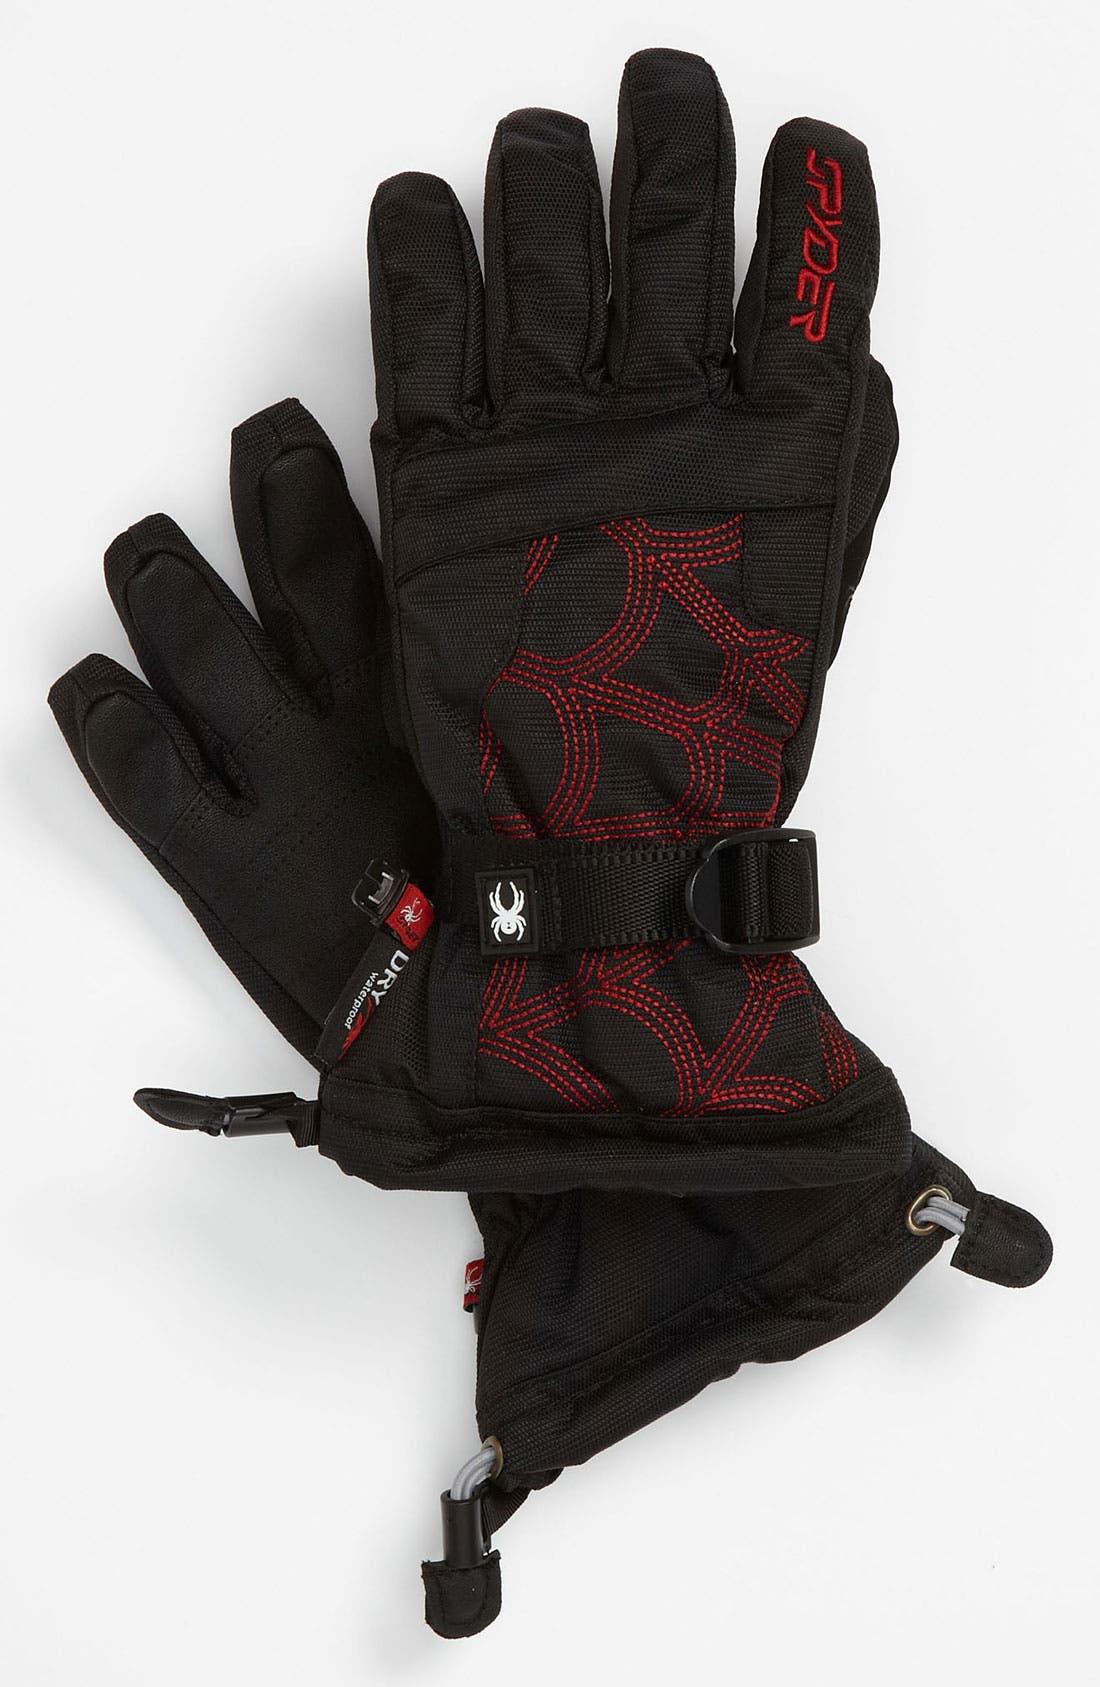 Alternate Image 1 Selected - Spyder 'Over Web' Ski Glove (Boys)